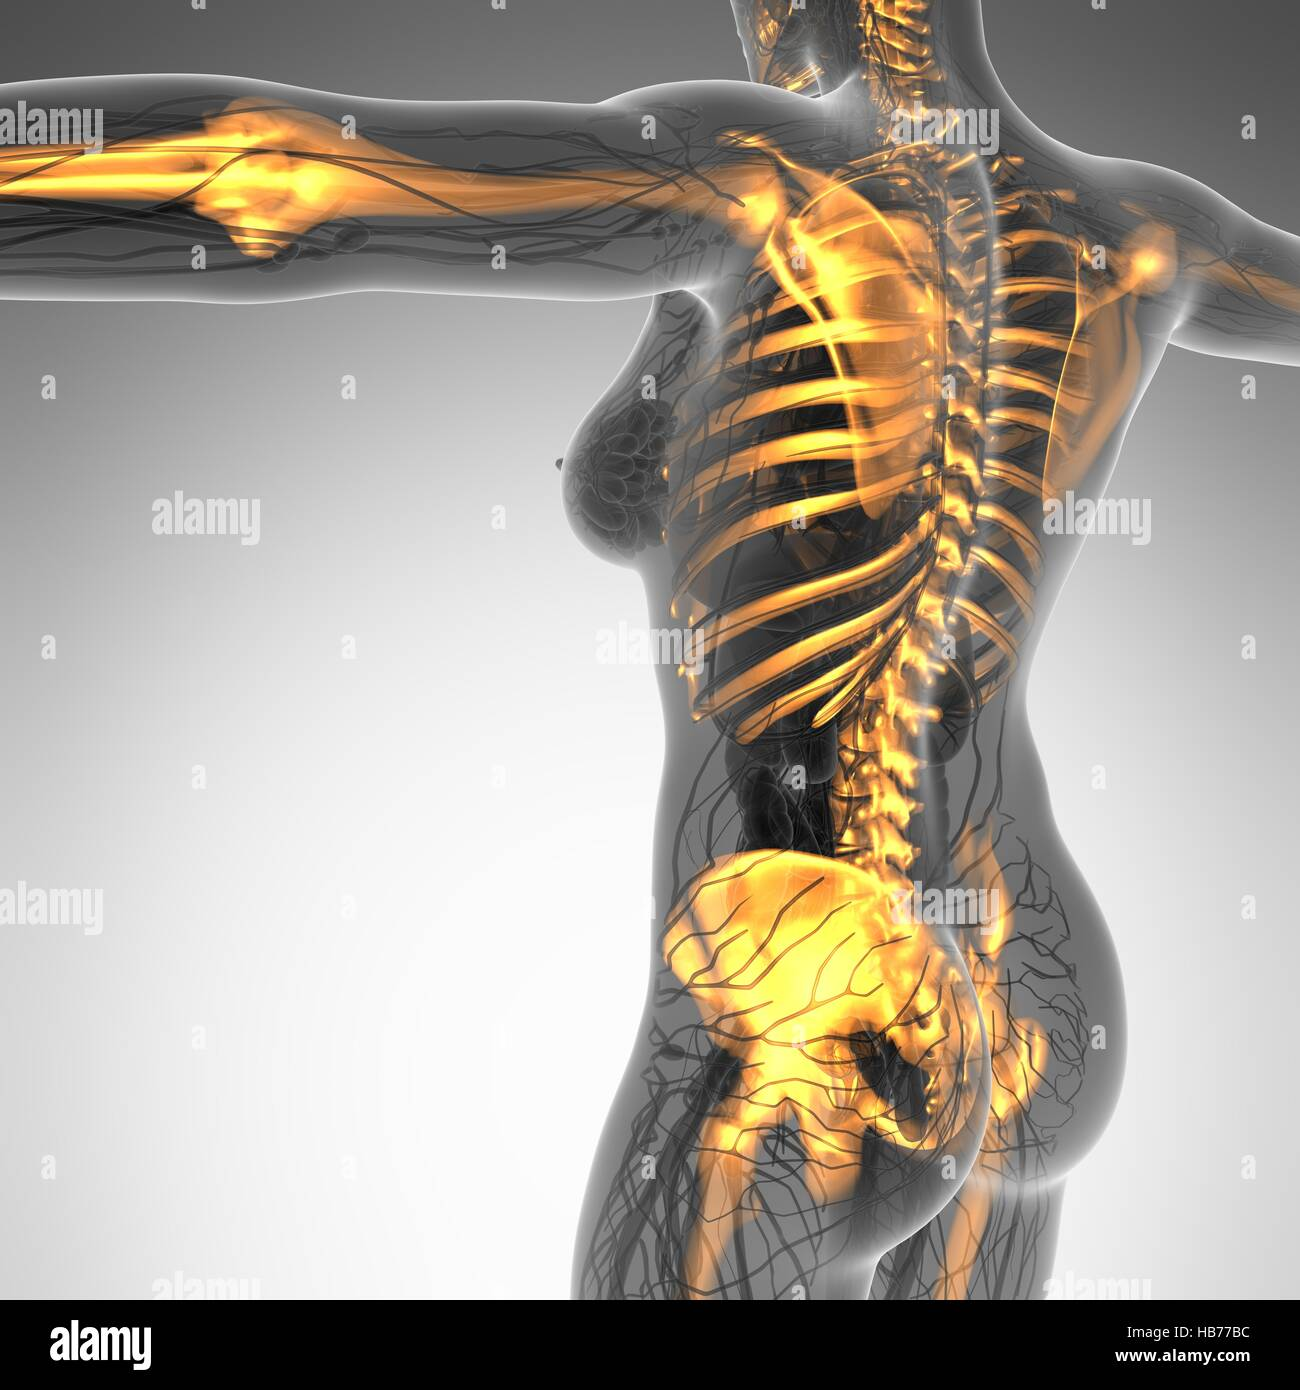 Back Pain Science Stockfotos & Back Pain Science Bilder - Seite 12 ...